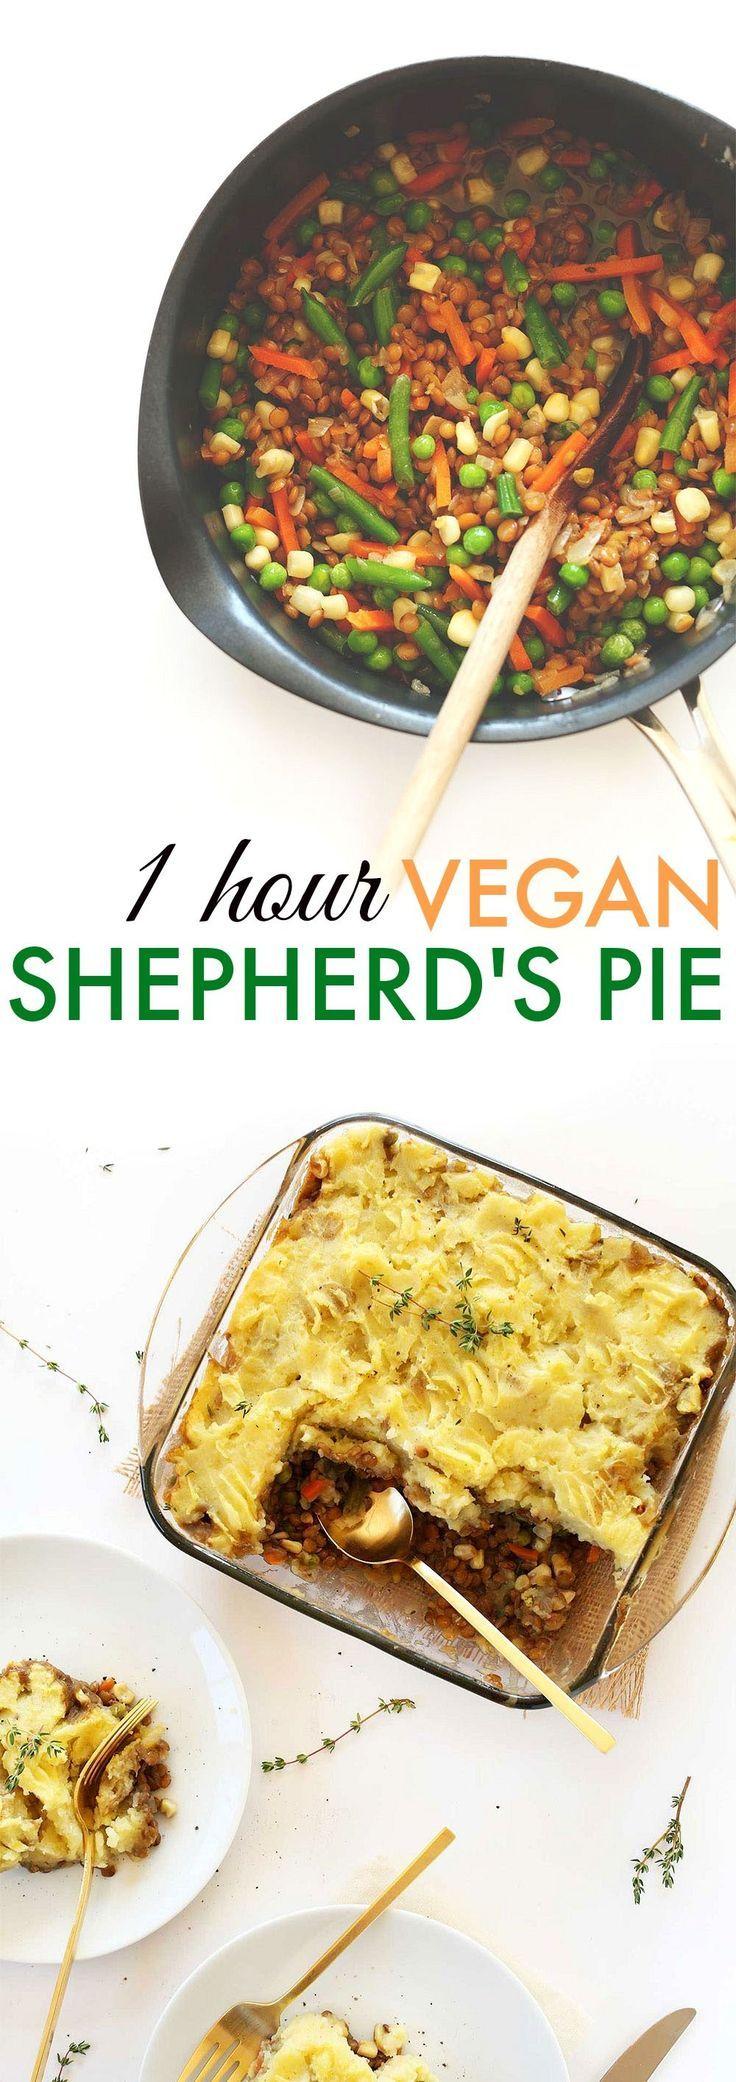 Vegan Shepherd's Pie - Easy & delicious version with veggies, lentils and the perfect potato mash! http://minimalistbaker.com/1-hour-vegan-shepherds-pie/?crlt.pid=camp.wnsMLhqezZsC